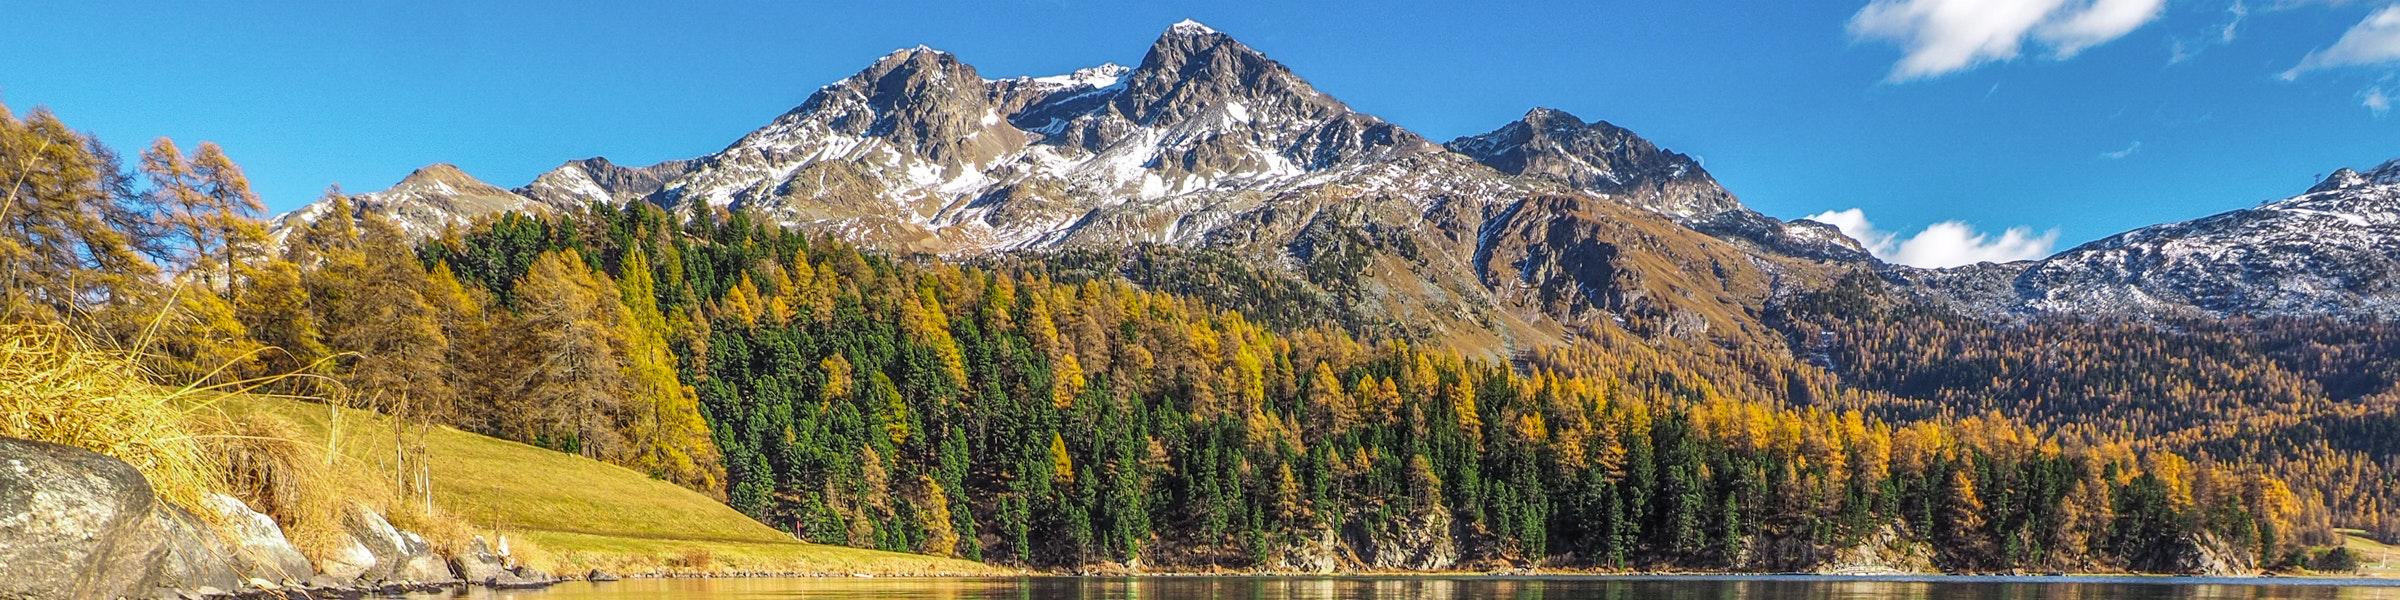 Lake Silvaplana in autumn